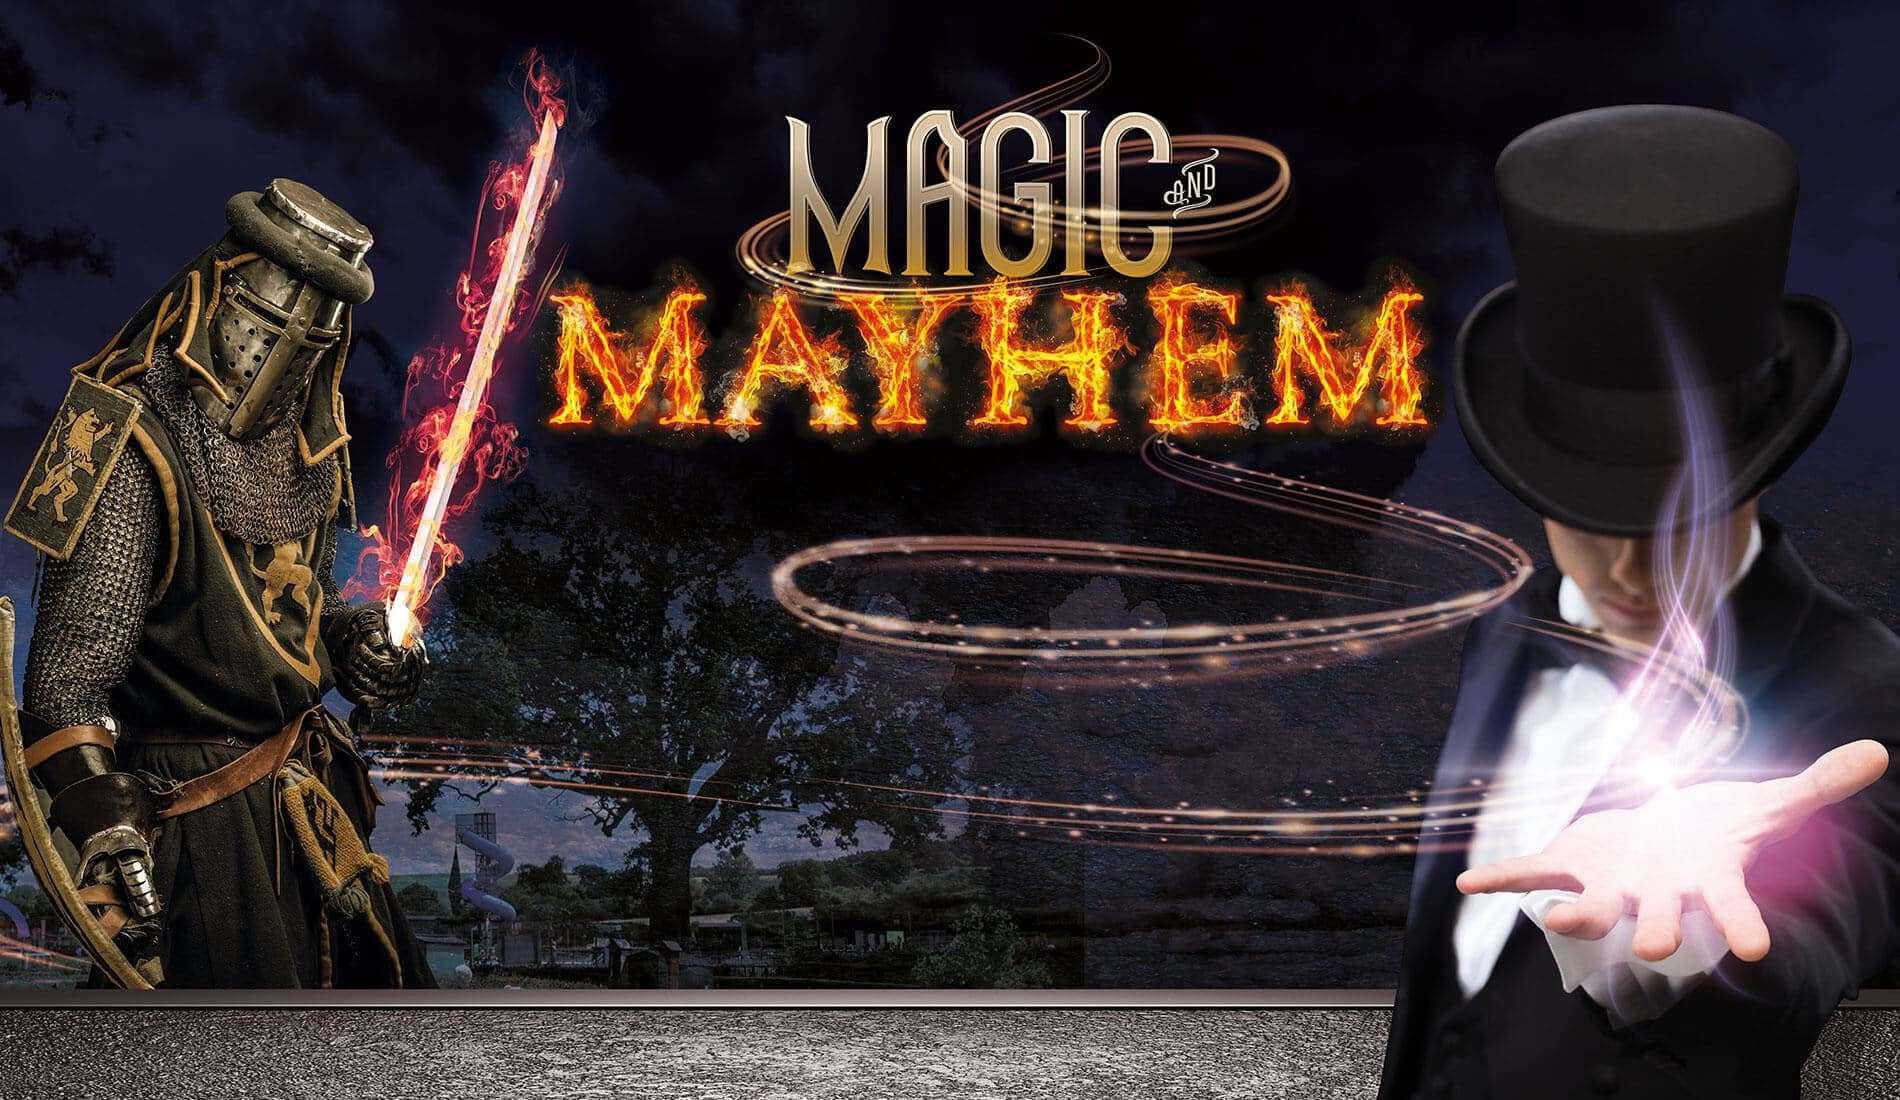 Hatton Magic and Mayhem design